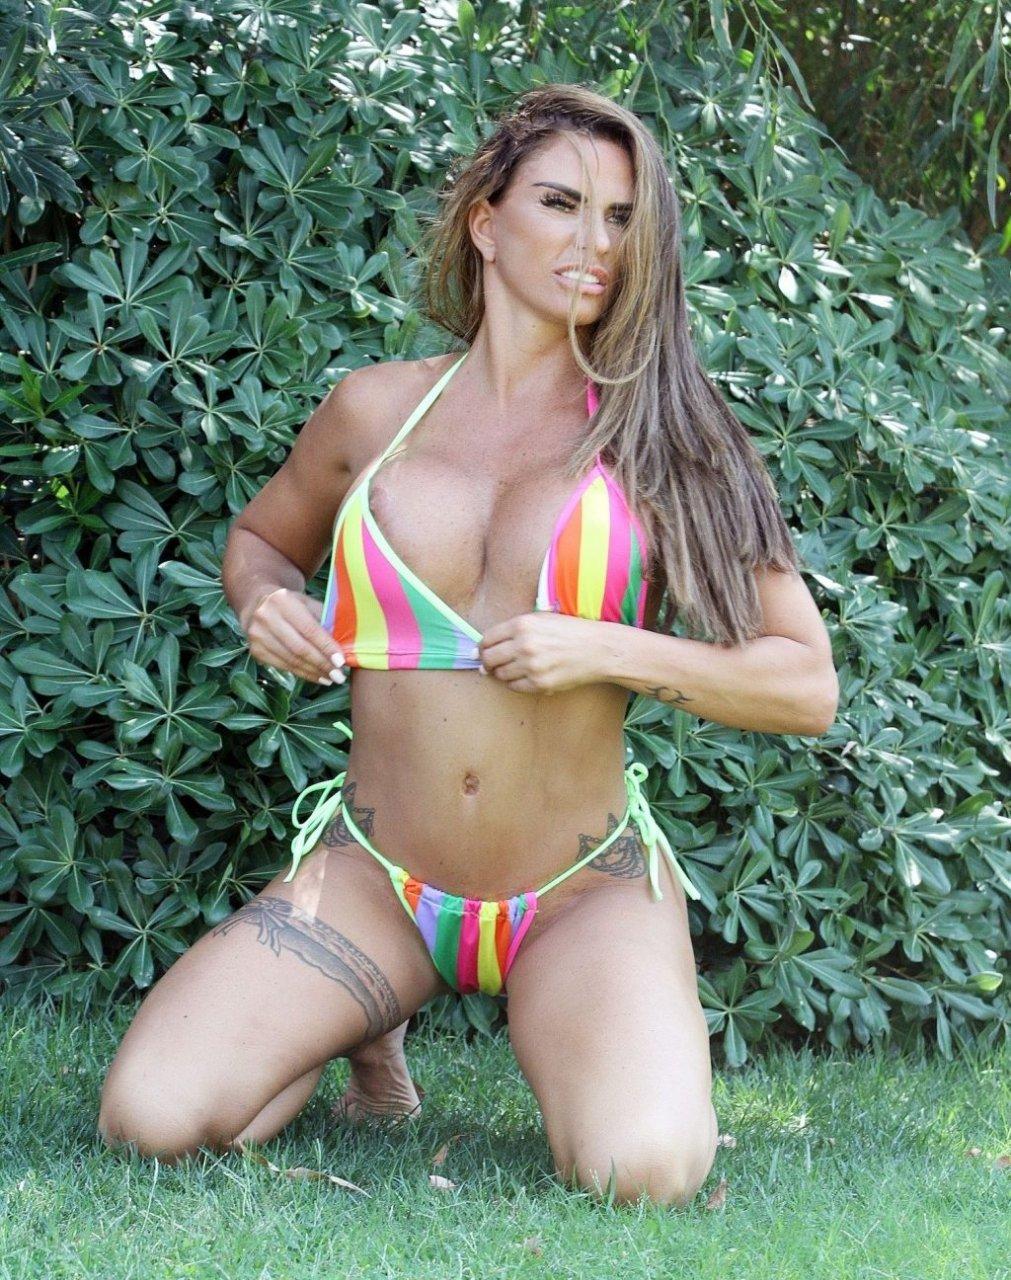 Katie-Price-Nude-Sexy-TheFappeningBlog.com-56-1024x1297.jpg